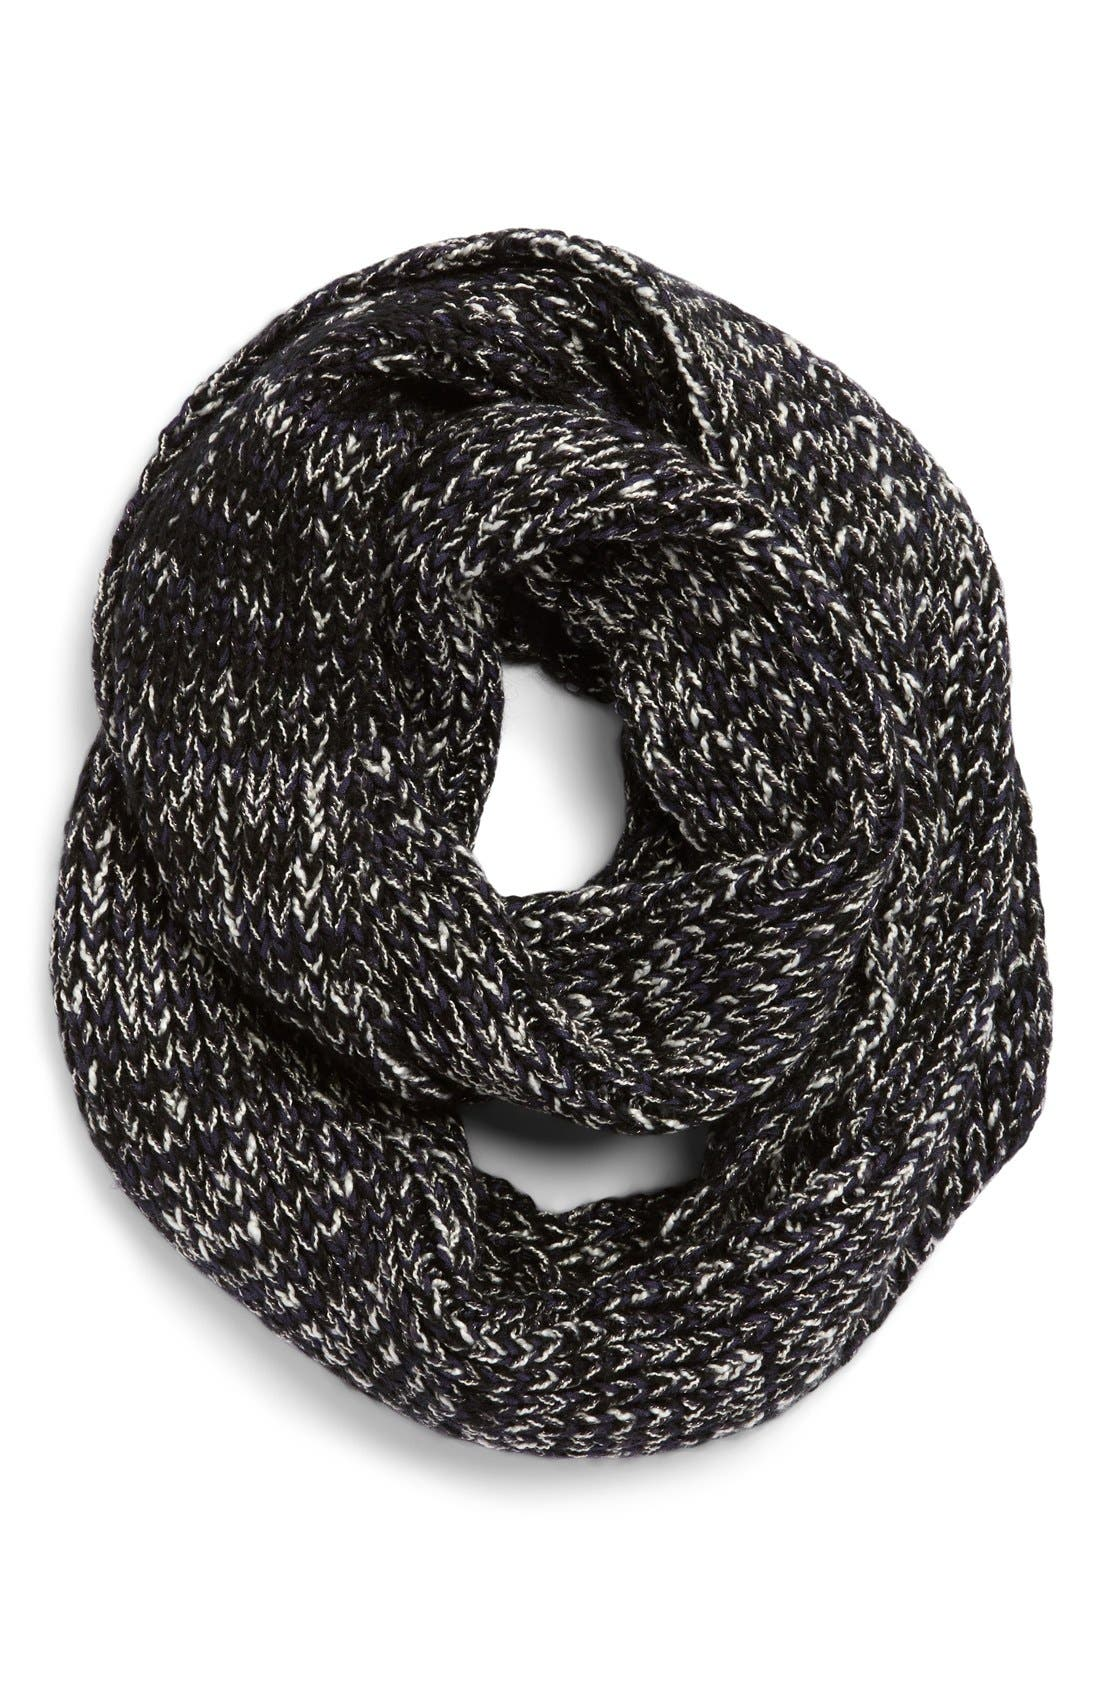 Main Image - Eugenia Kim 'Lane' Knit Infinity Scarf